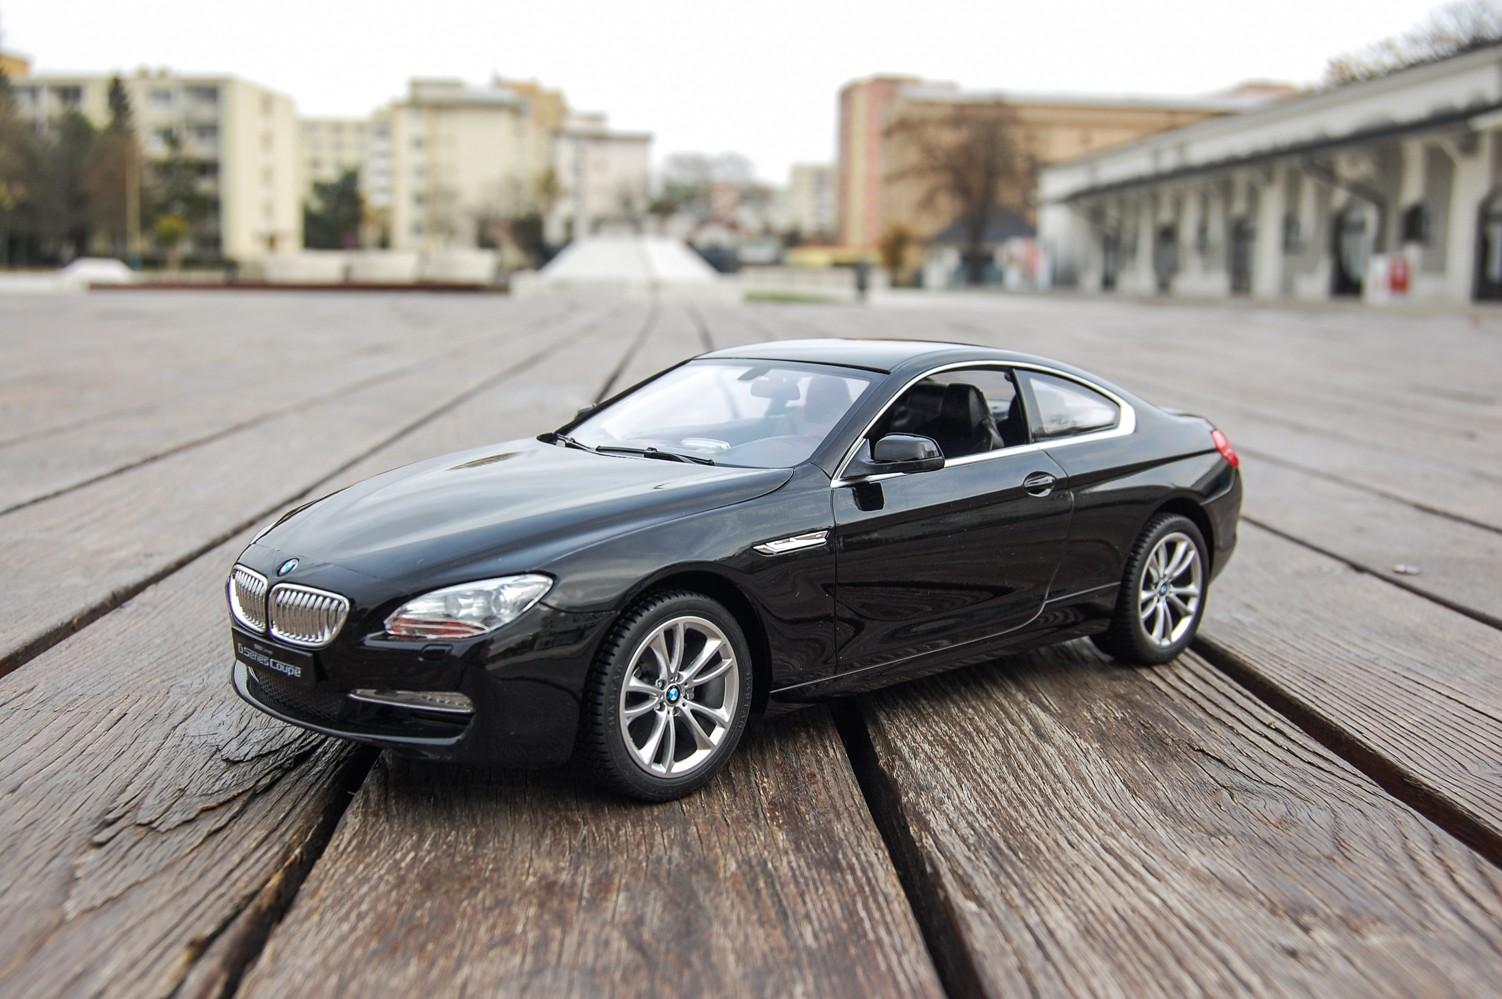 BMW 6 RASTAR 01:14